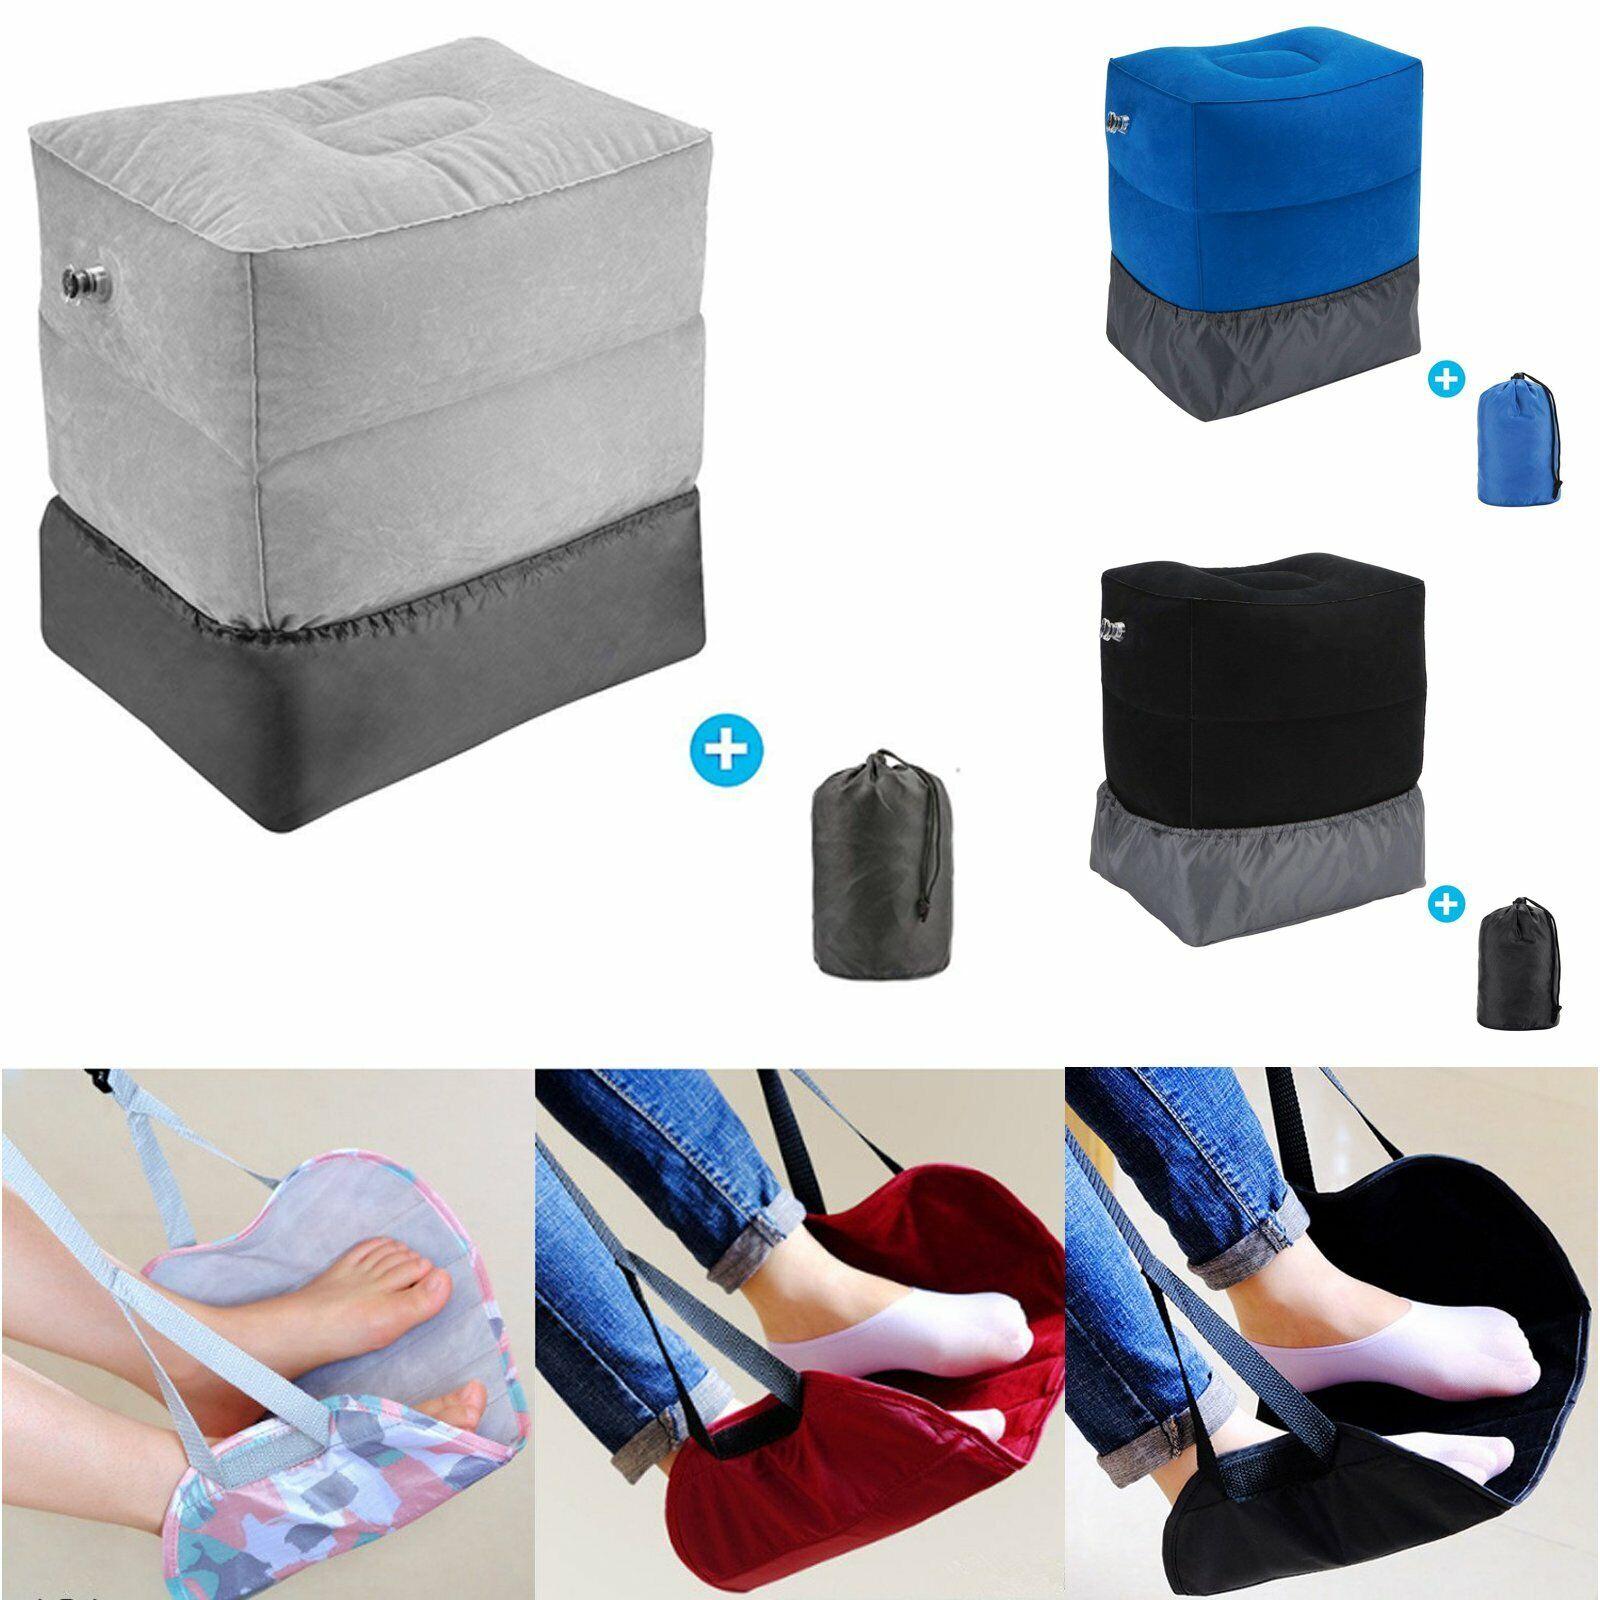 Travel Footrest Inflatable Hammock Plane Train Leg Foot Rest Pad Pillo... - s l1600